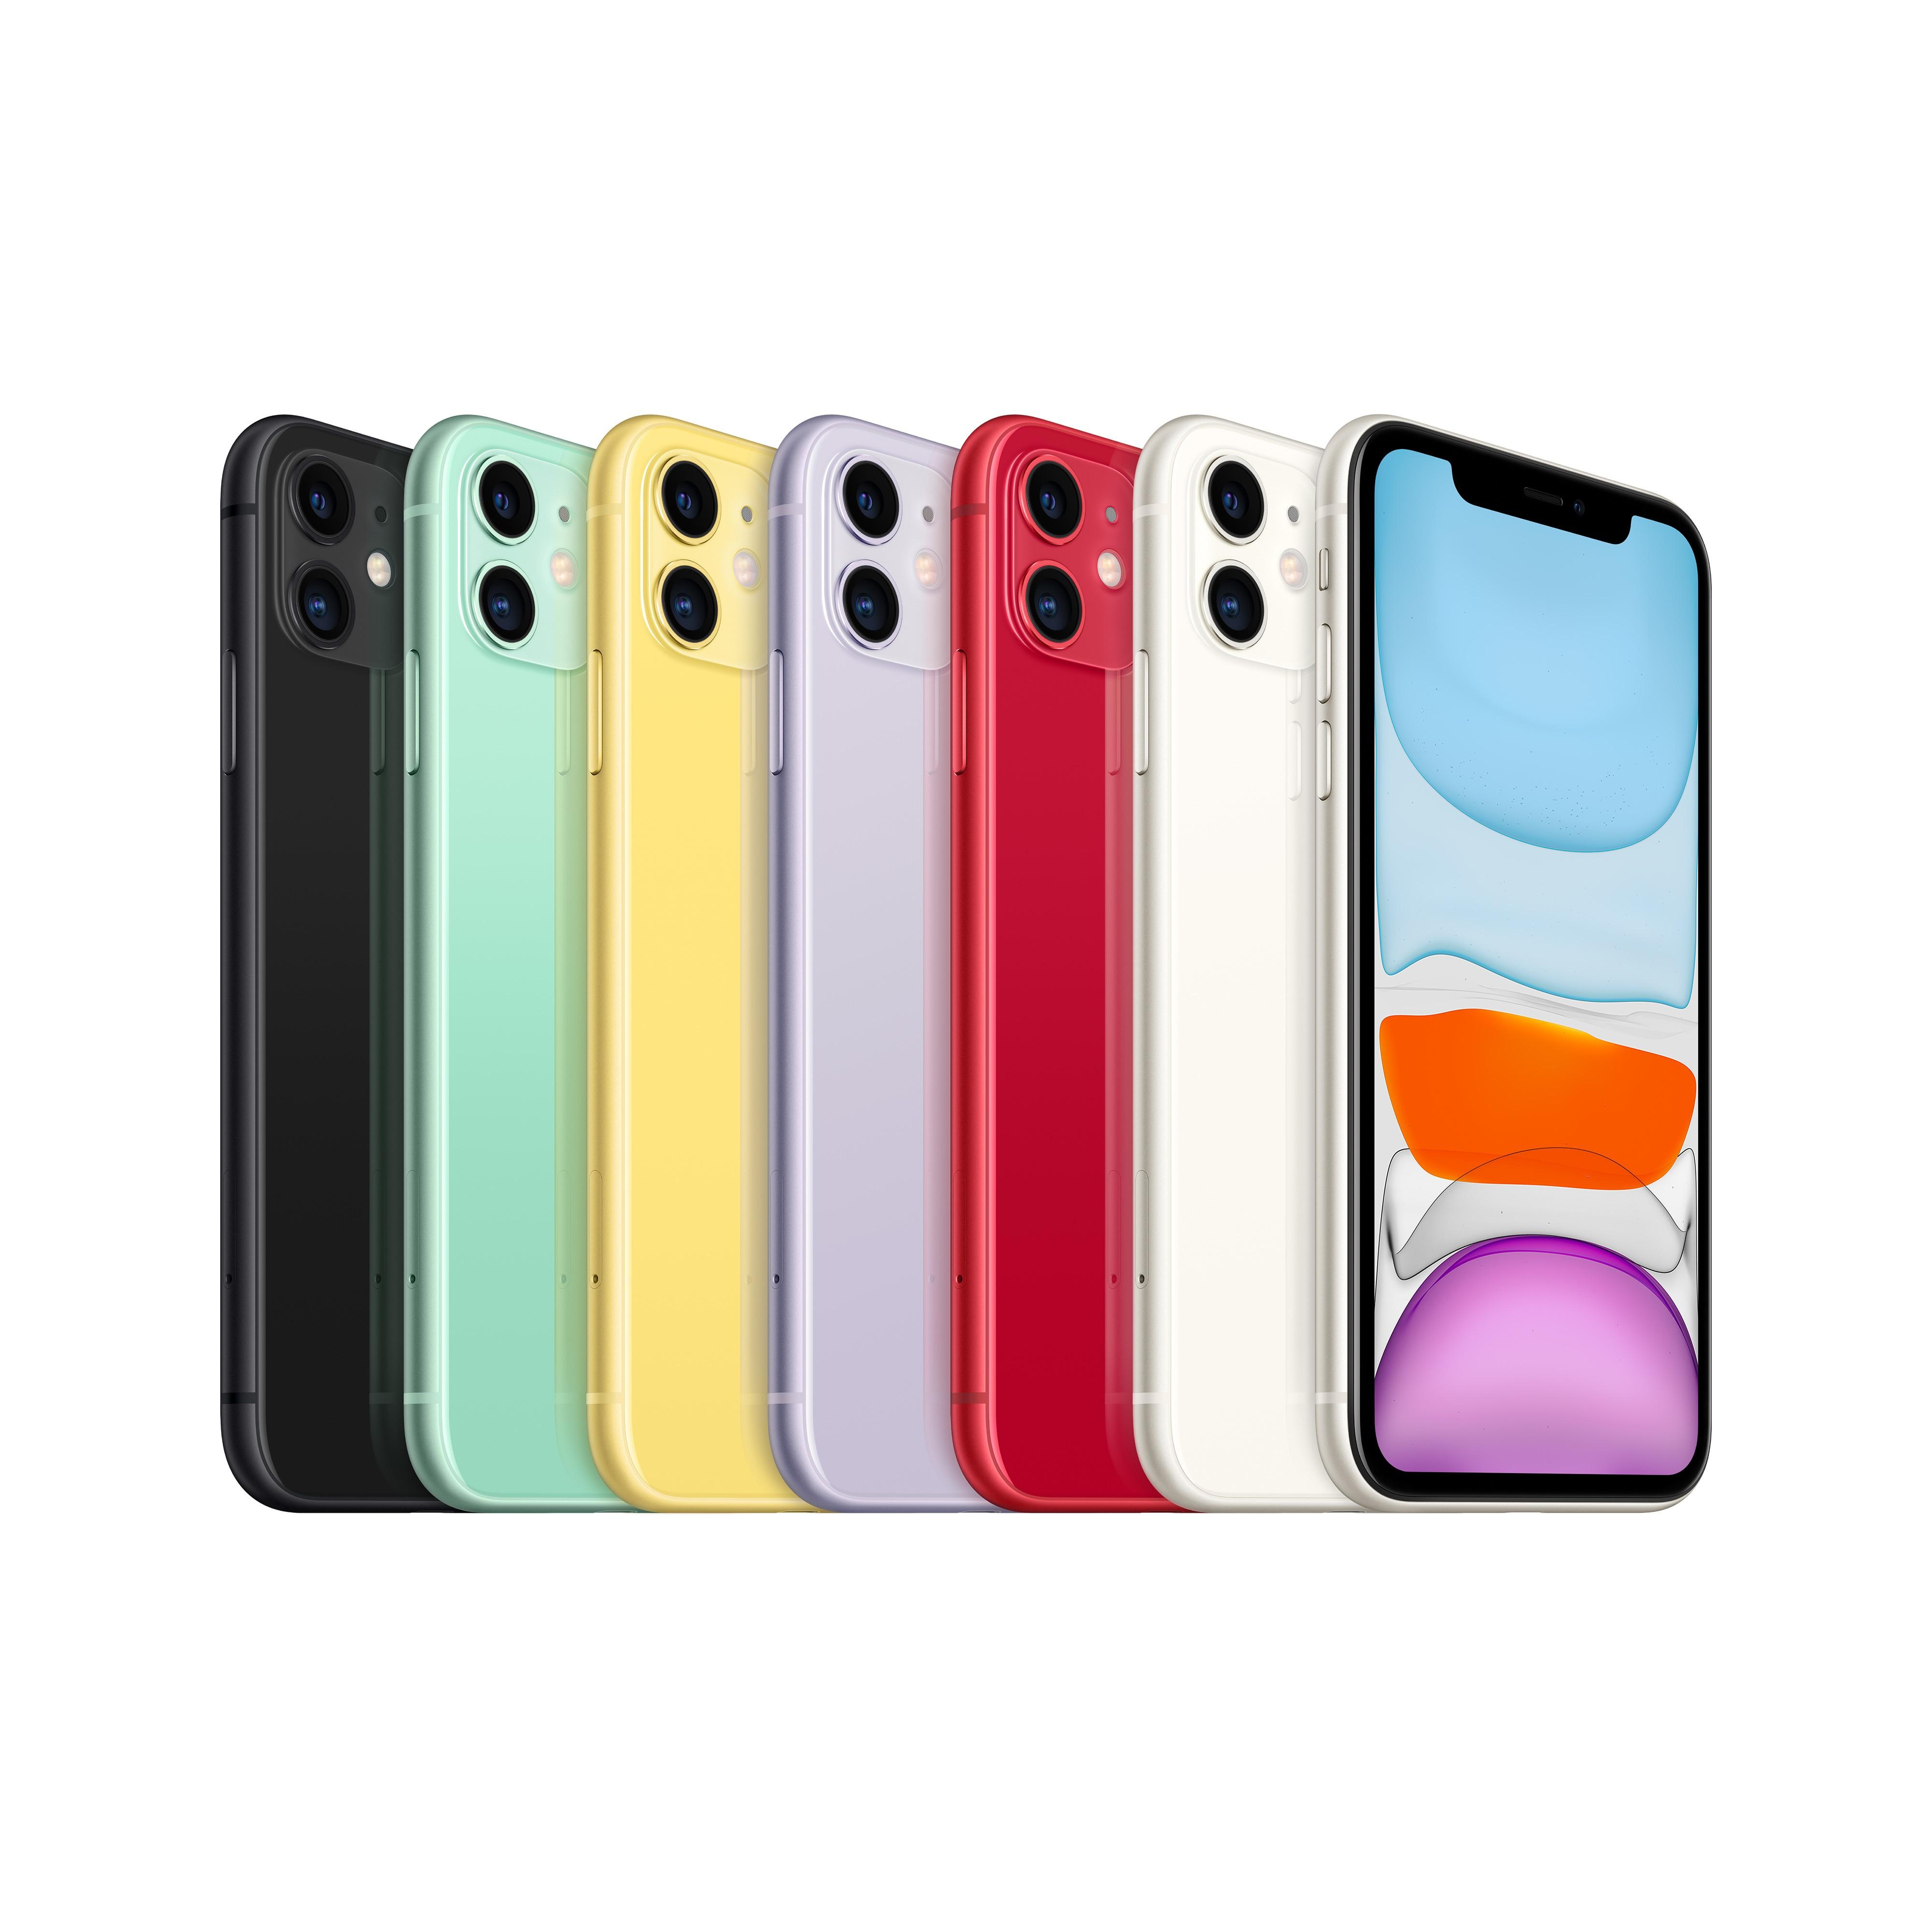 iPhone 11/64gb 712€///iPhone 11/128gb 756€   Entrega gratuita 4/5 dias. Envío desde España.